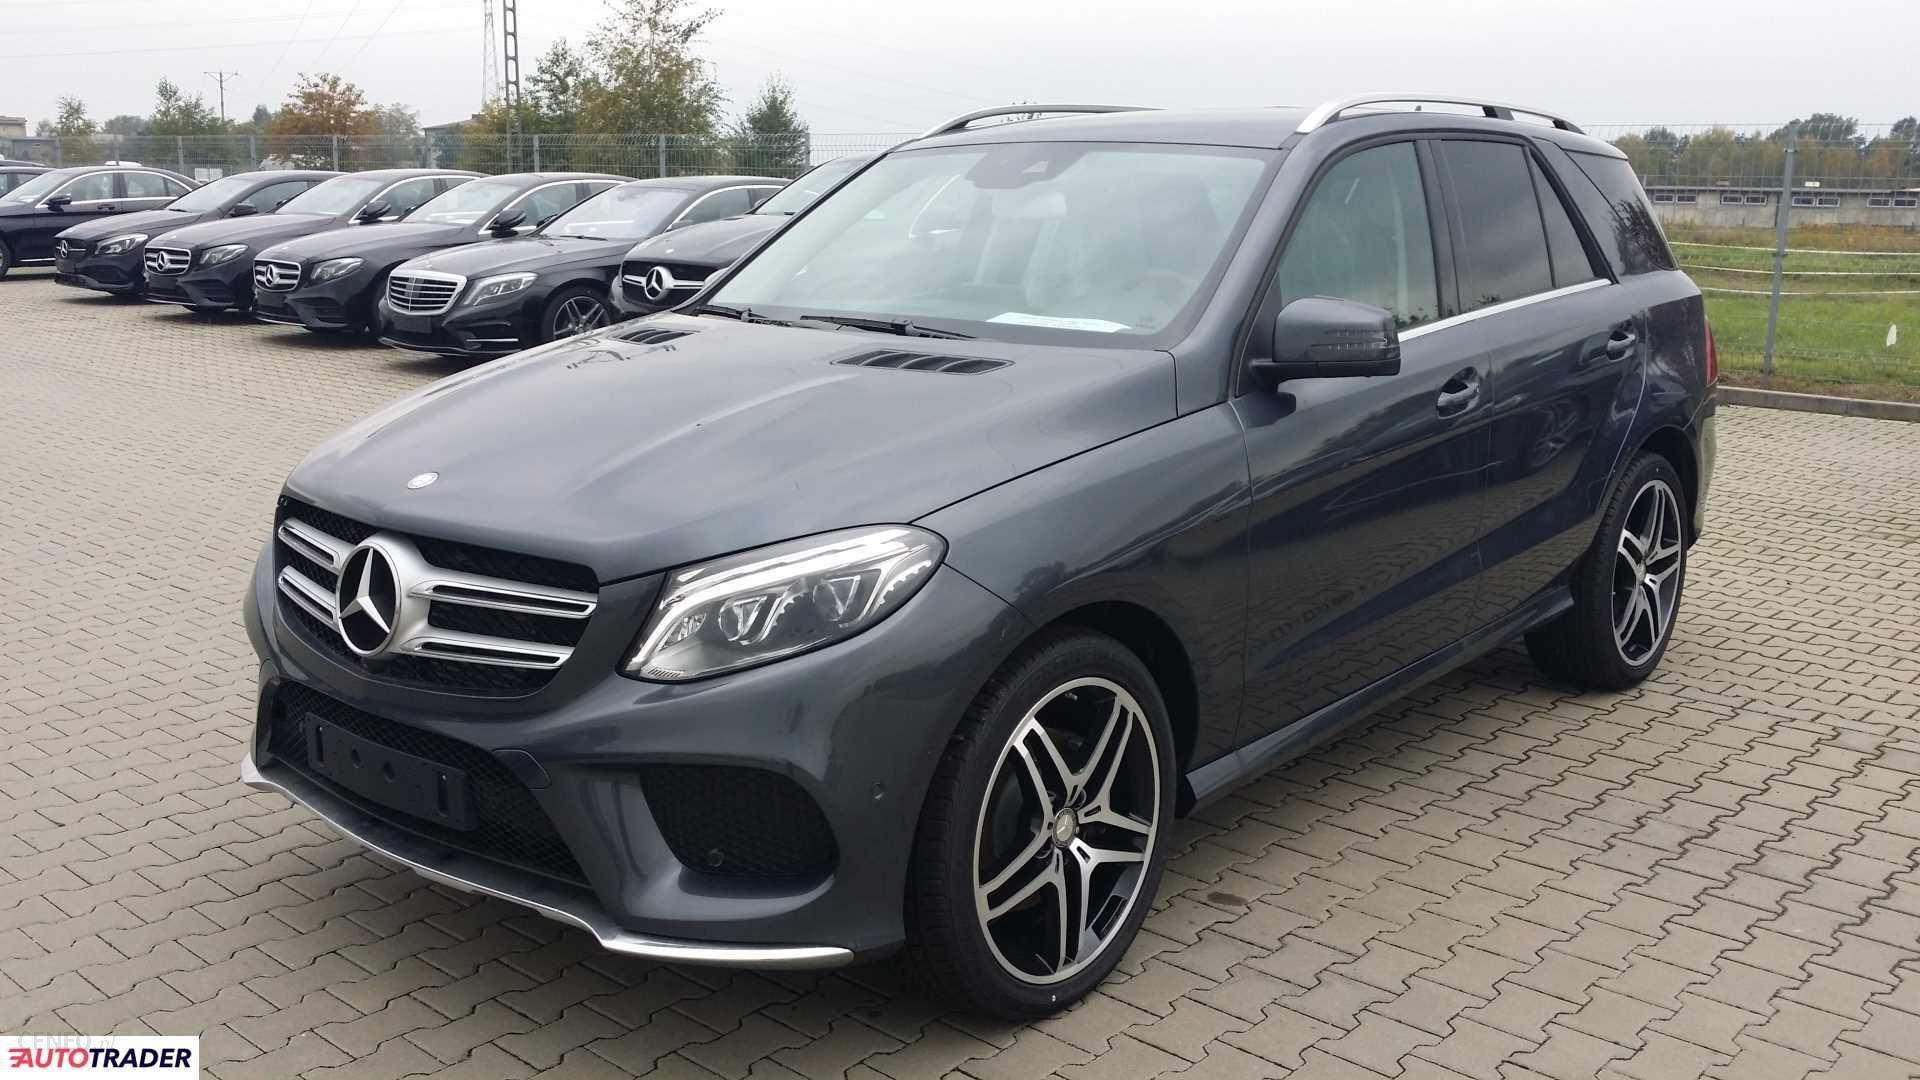 Mercedes GLE 2018 204KM suv Opinie i ceny na Ceneo